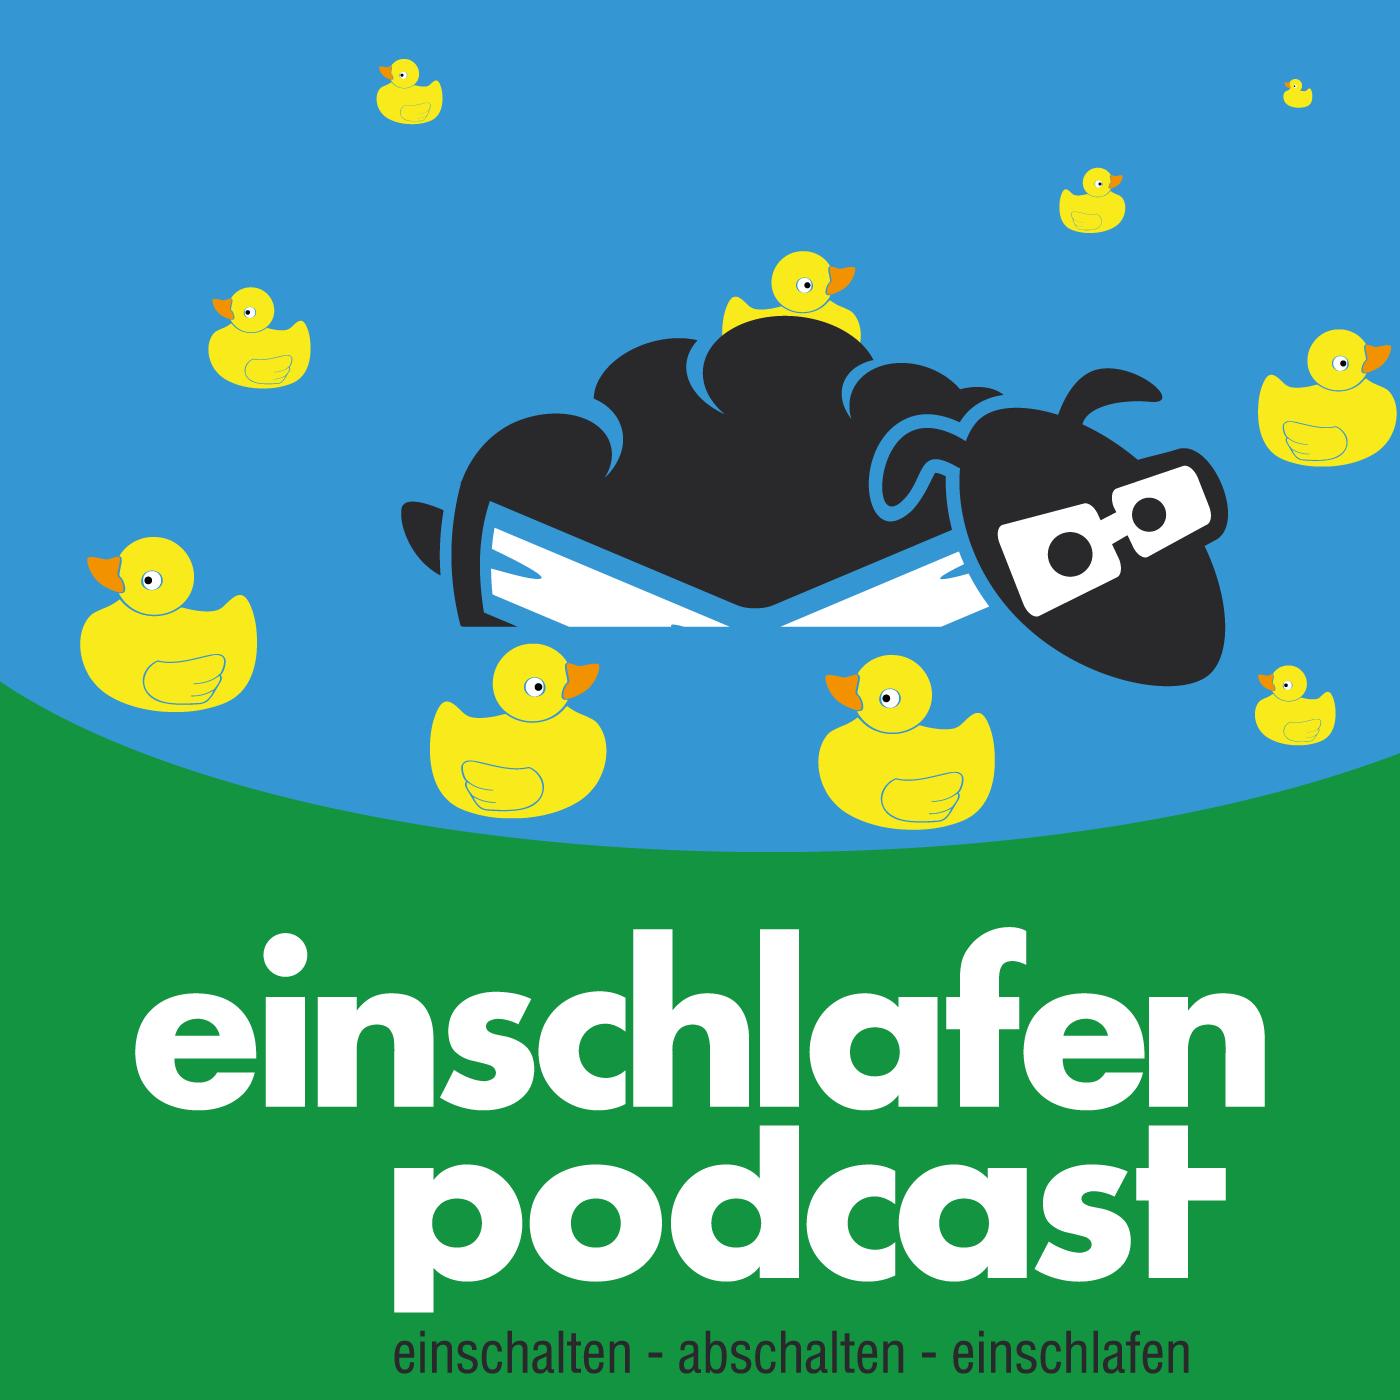 EP 306 - Fabian Boll, Entenrennen und Sherlock Holmes - Episodenbild